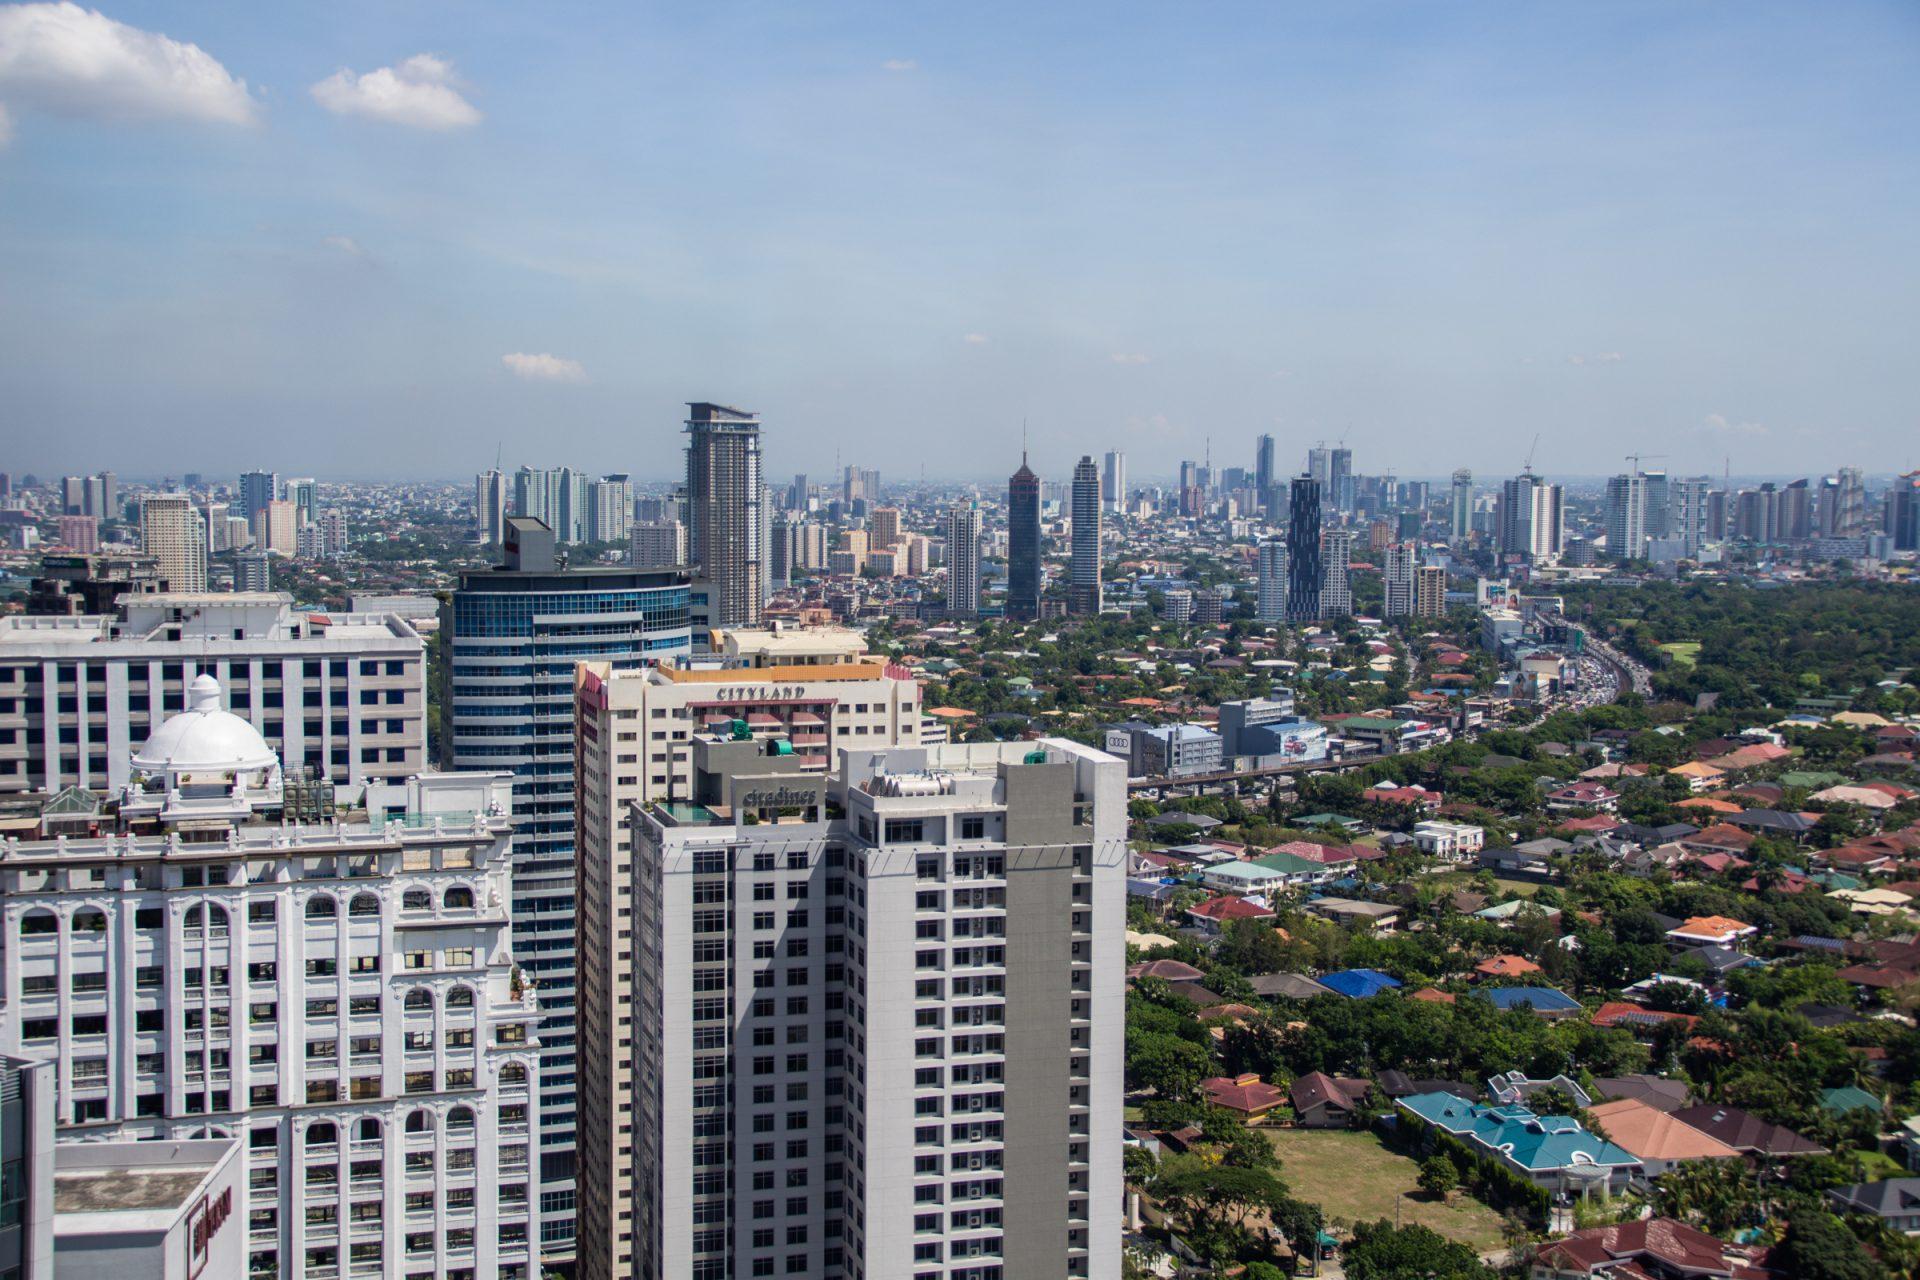 Manila Skyline Beyond High Rise Buildings